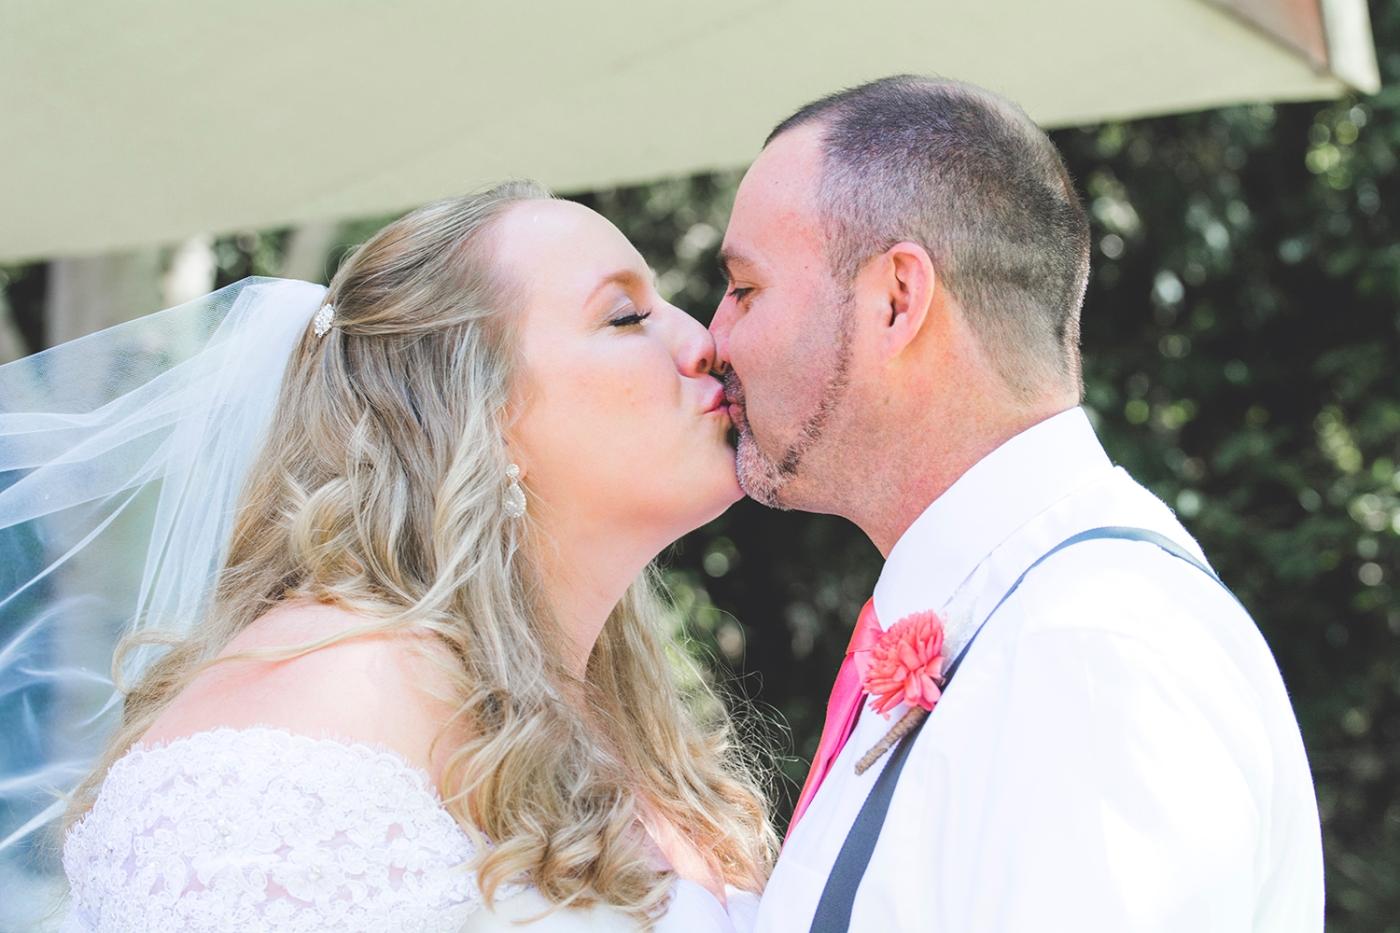 Jane_S_photography_Kadie_and_Steve_2016_Des_Moines_Marina_WeddingJS7_9156